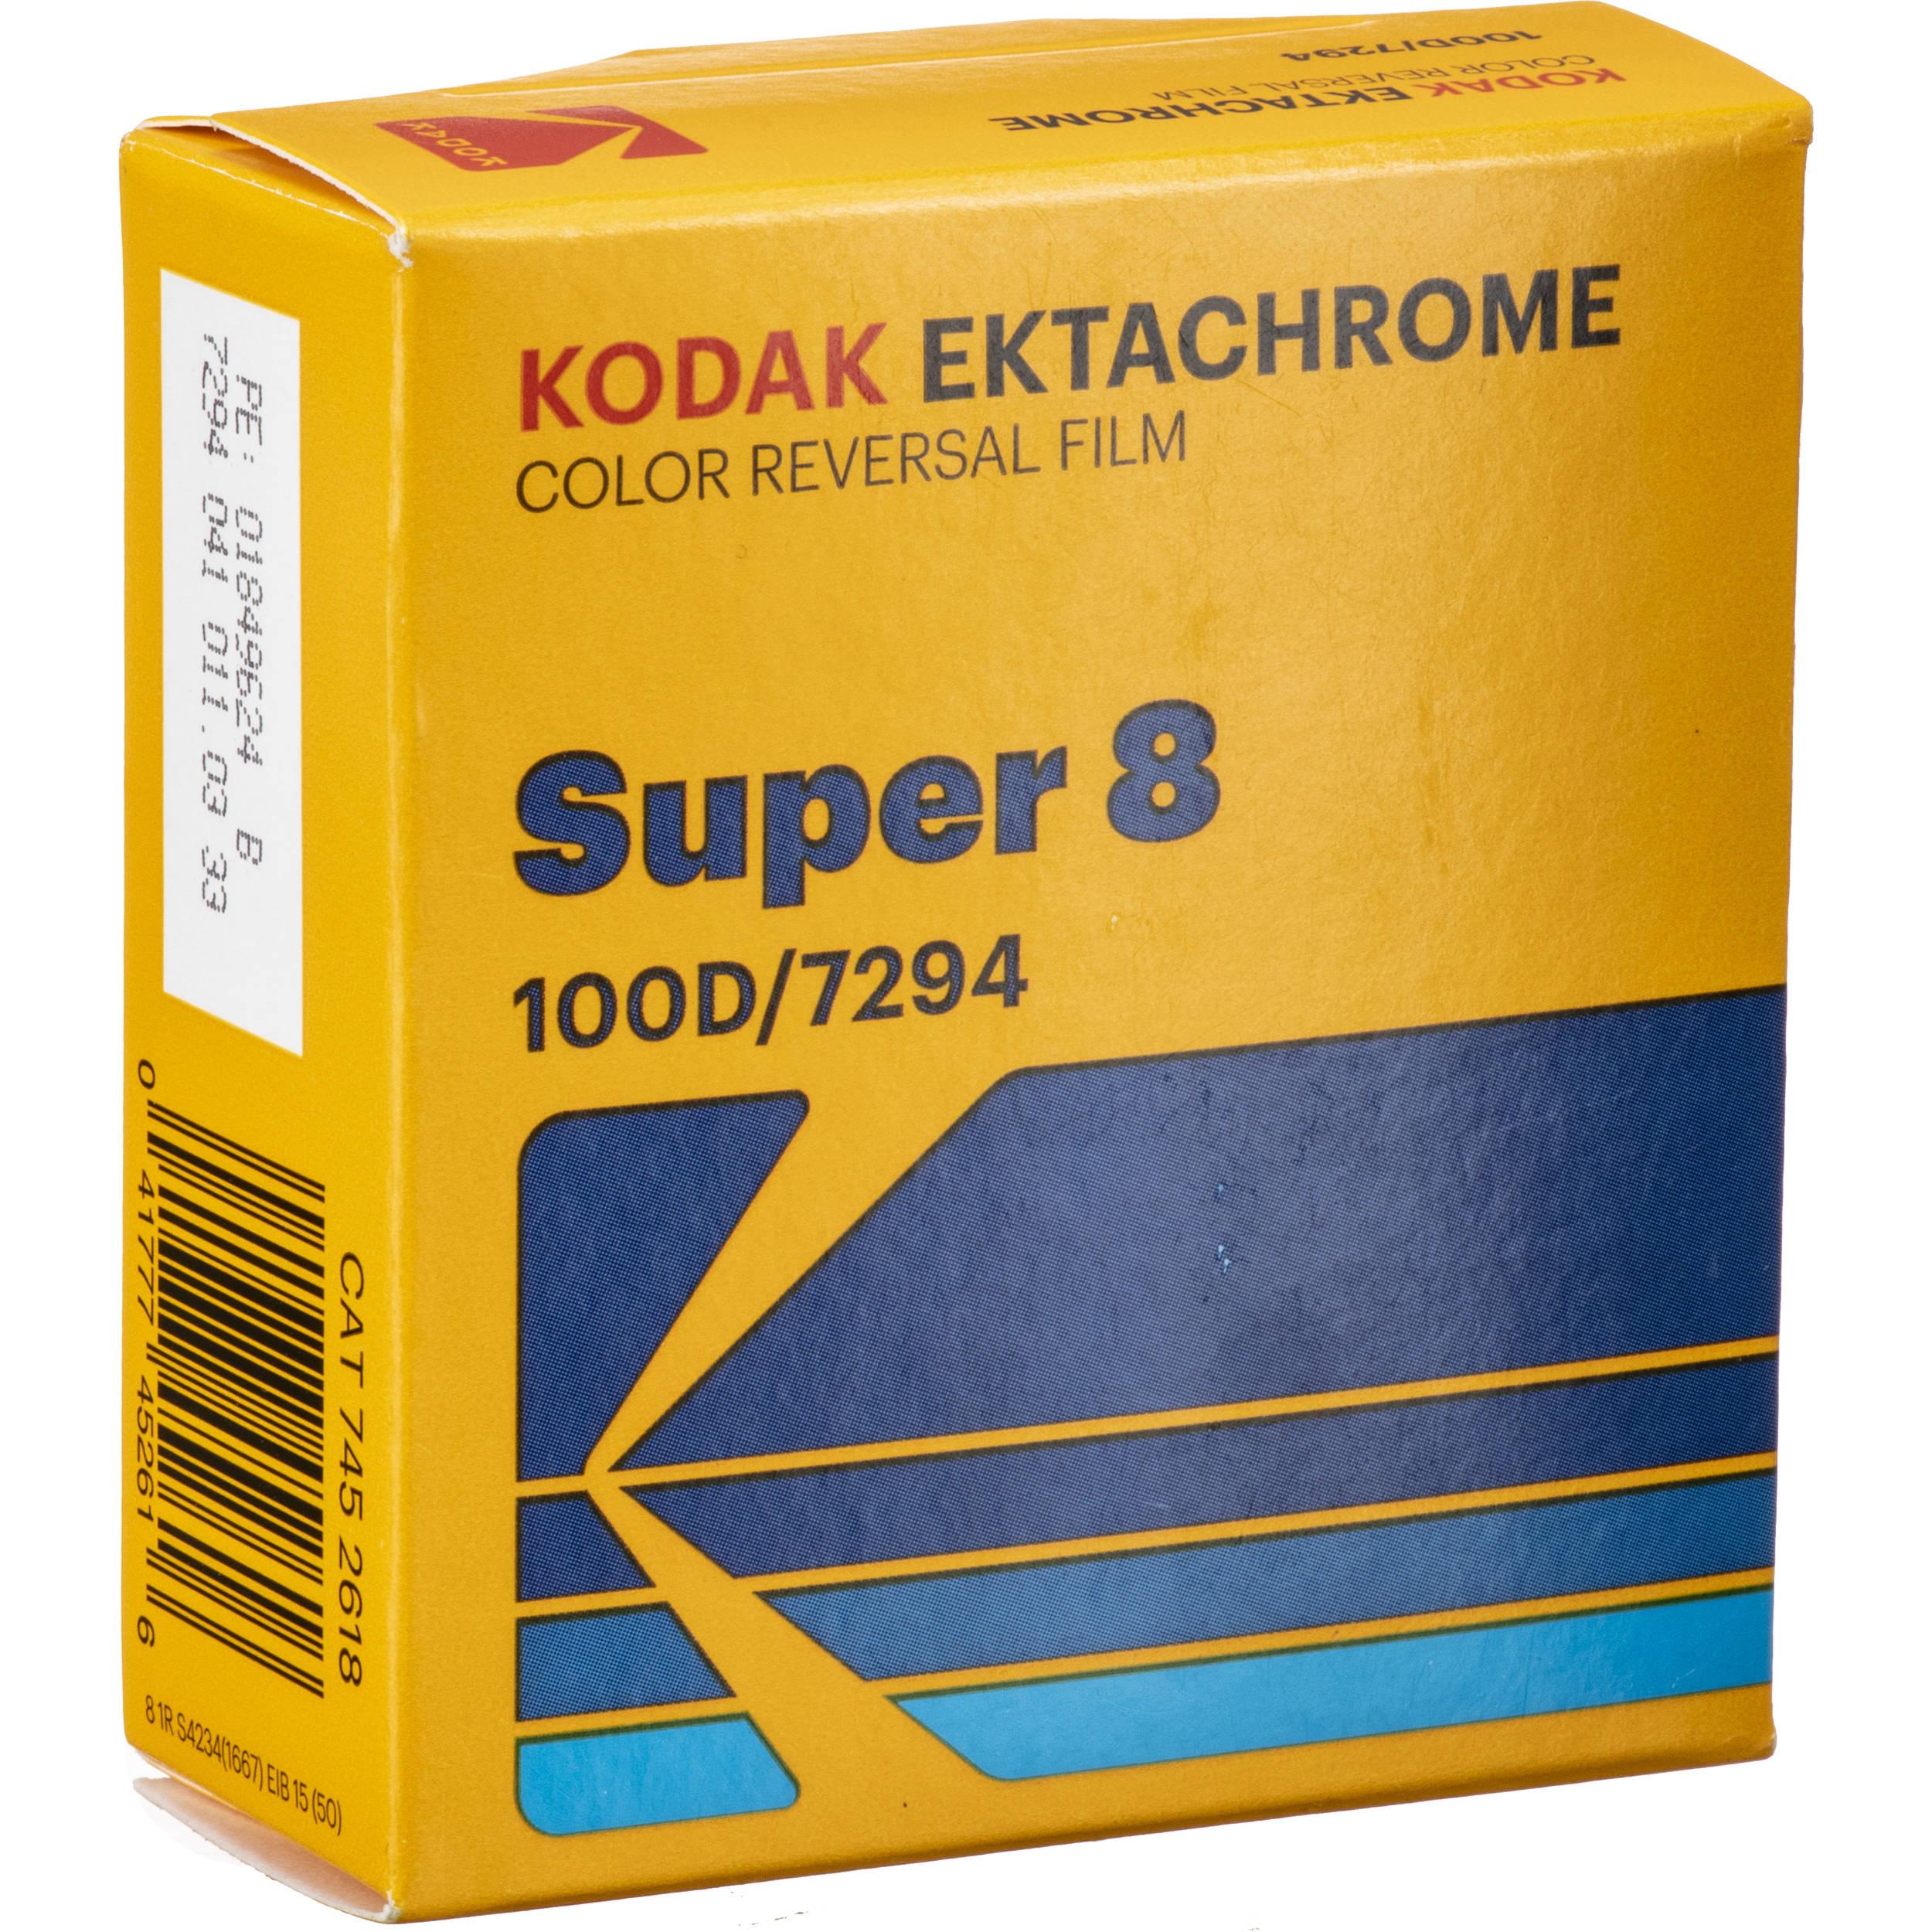 Kodak Ektachrome 100D Color Transparency Film #7294 (Super 8, 50' Roll)